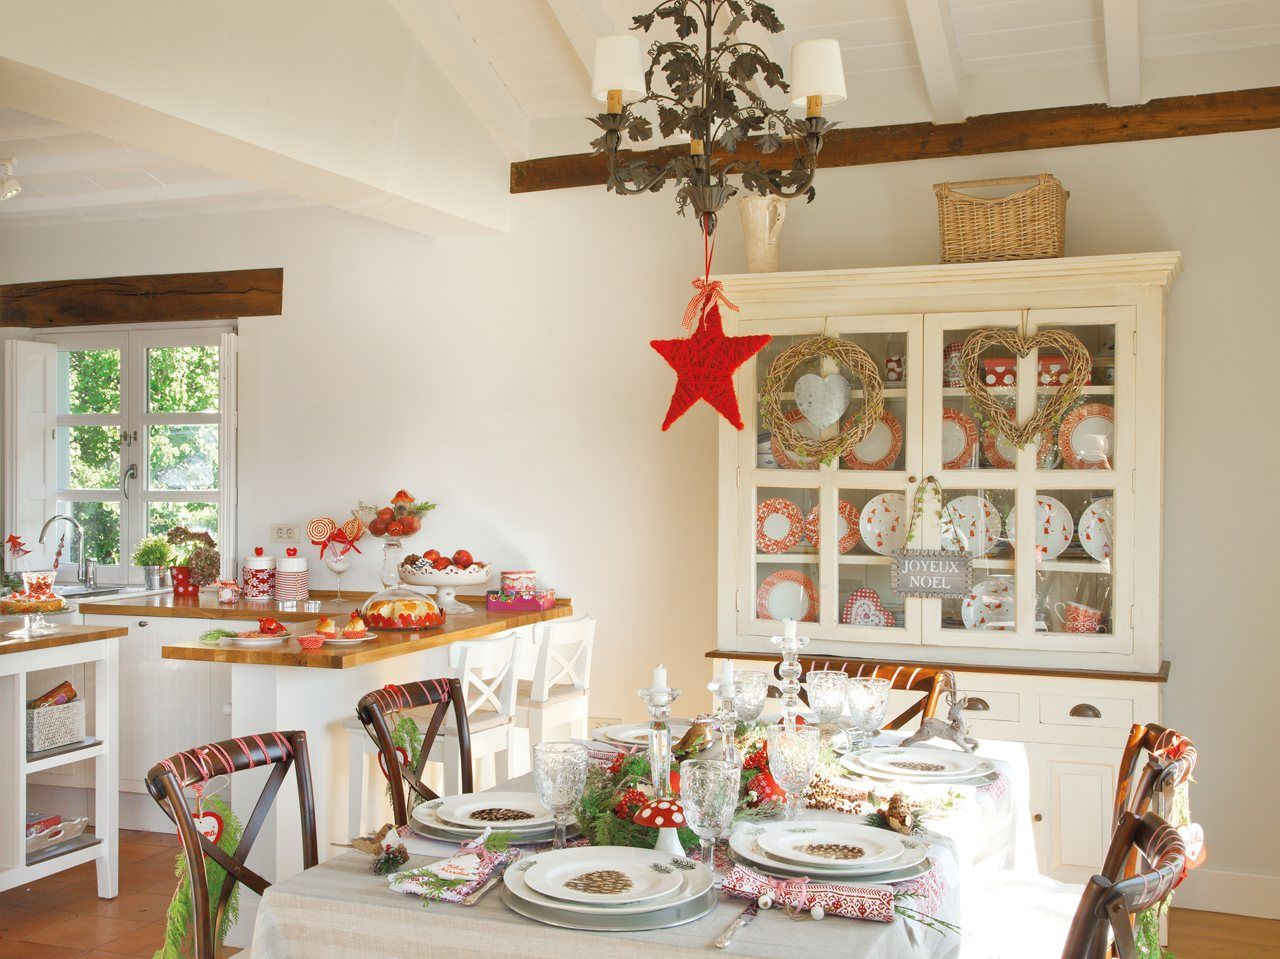 Un día lleno de magia: adornar la casa de Navidad · ElMueble.com ...